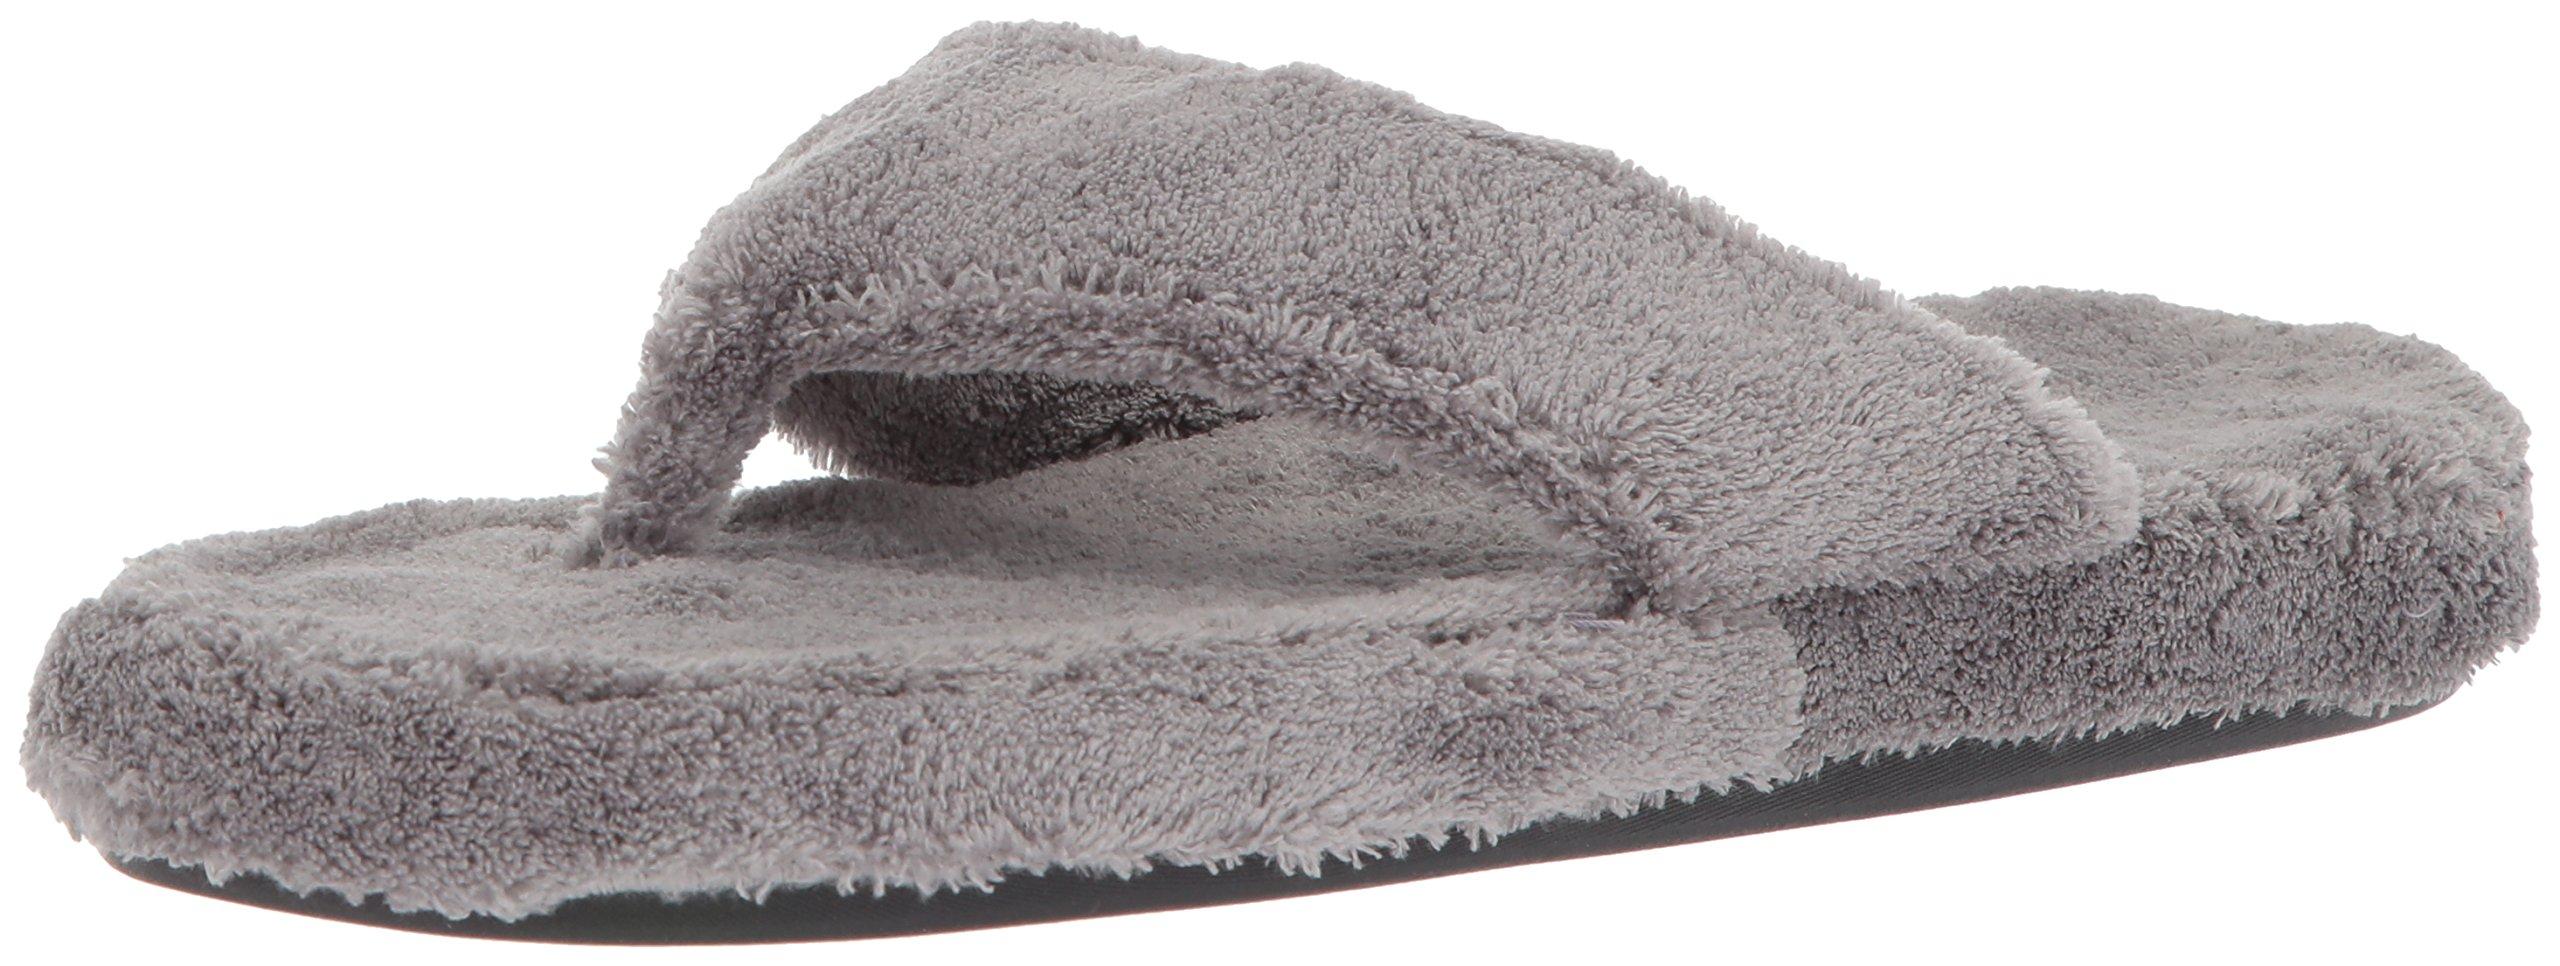 Acorn Women's Spa Thong Slipper, Grey, Large/8-9 B(M) US by Acorn